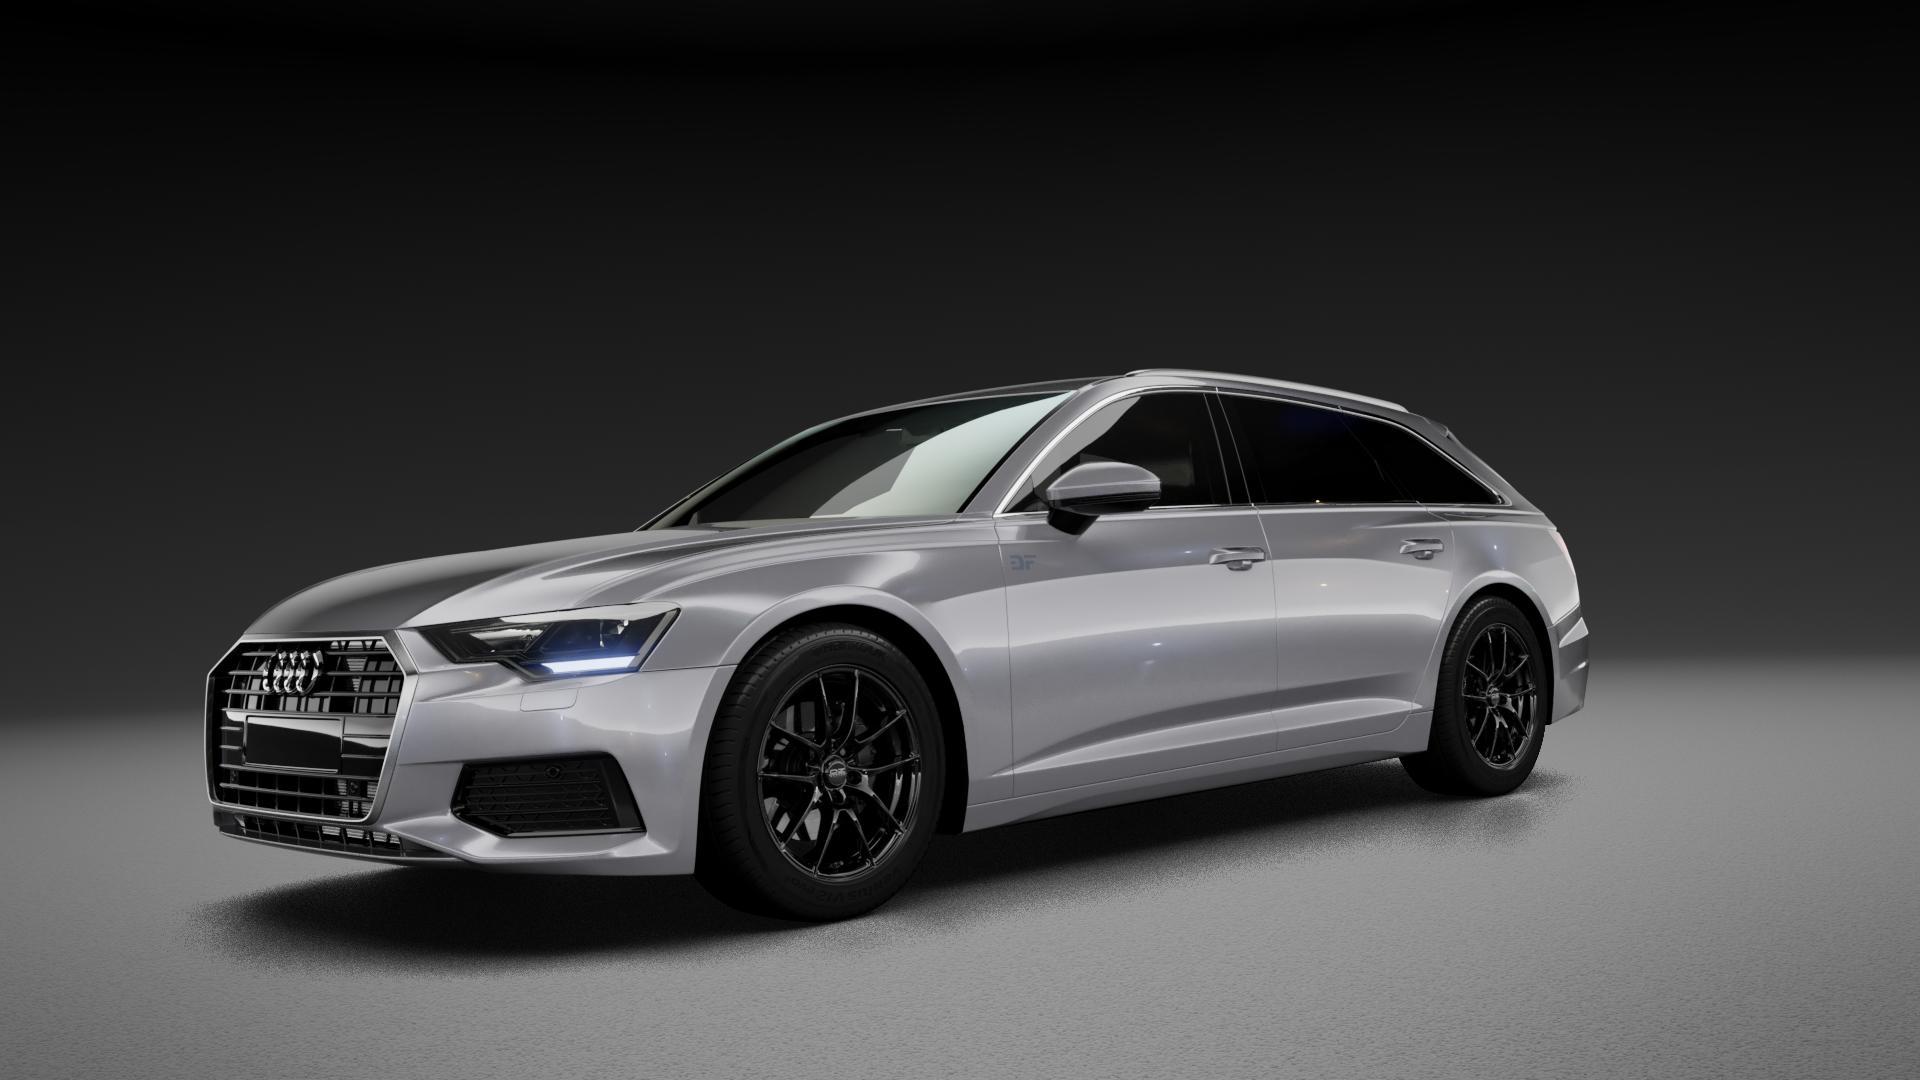 OZ RACING LEGGERA HLT GLOSS BLACK Felge mit Reifen schwarz in 18Zoll Winterfelge Alufelge auf silbernem Audi A6 Typ F2/C8 (Avant) 3,0l 45 TDI quattro 170kW Mild-Hybrid (231 PS) 50 210kW (286 55 TFSI 250kW (340 2,0l 40 150kW (204 155kW (211 180kW (245 35 120kW (163 S6 257kW (349 30 100kW (136 ⬇️ mit 15mm Tieferlegung ⬇️ Neutral_mid_max5300mm Fr